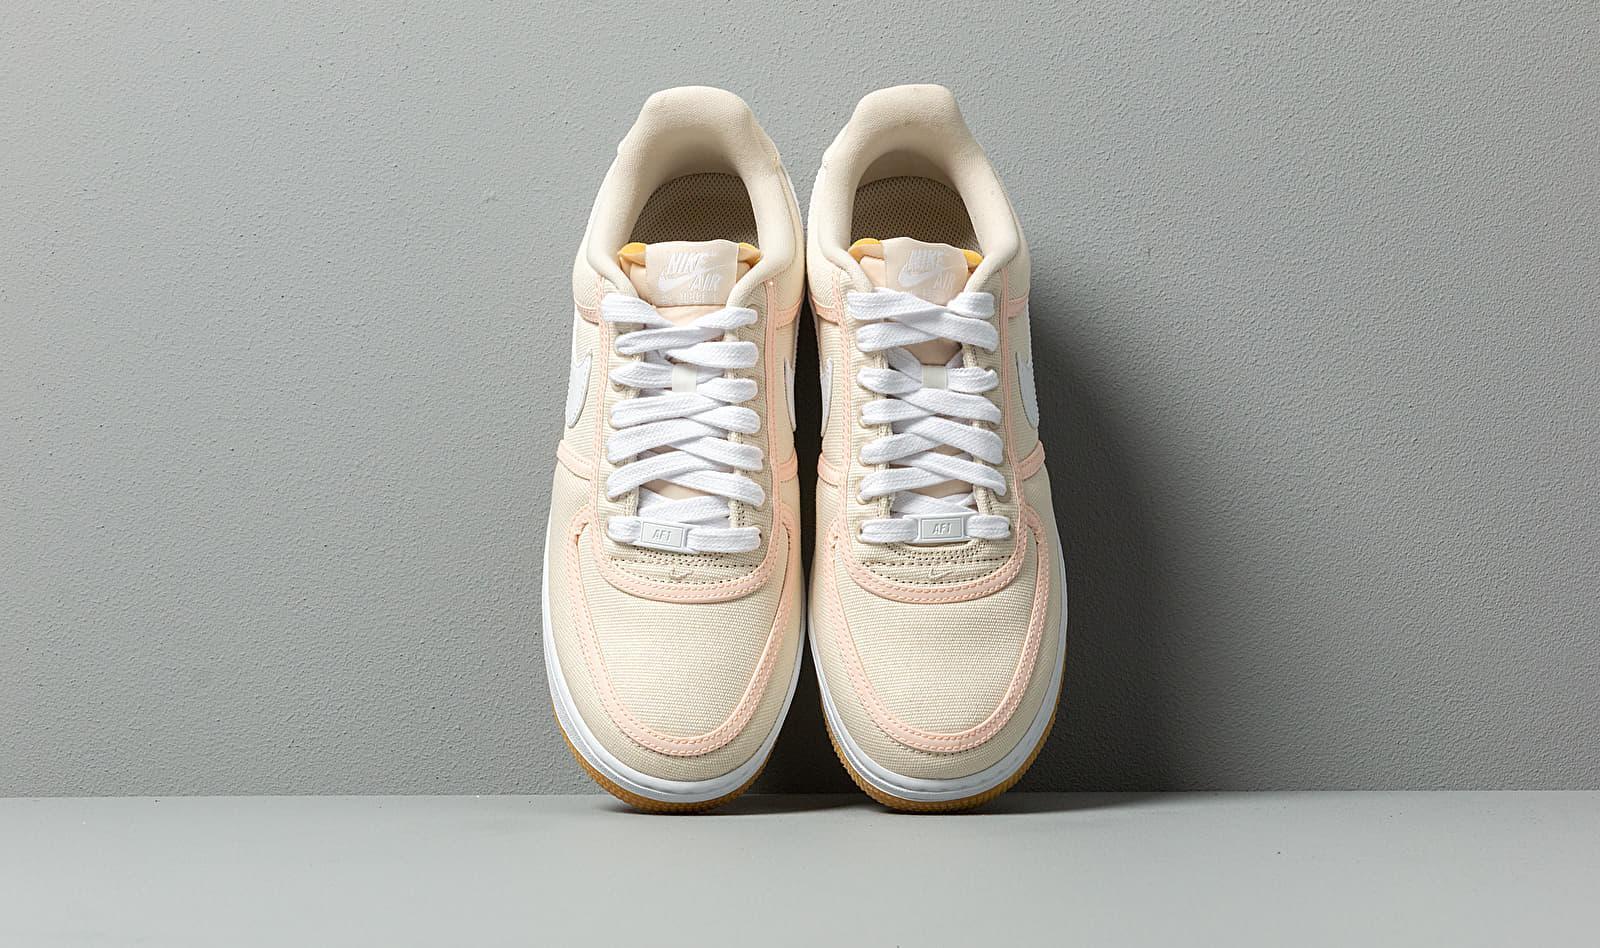 outlet exquisite design many fashionable Air Force 1 '07 Premium Light Cream/ White-crimson Tint